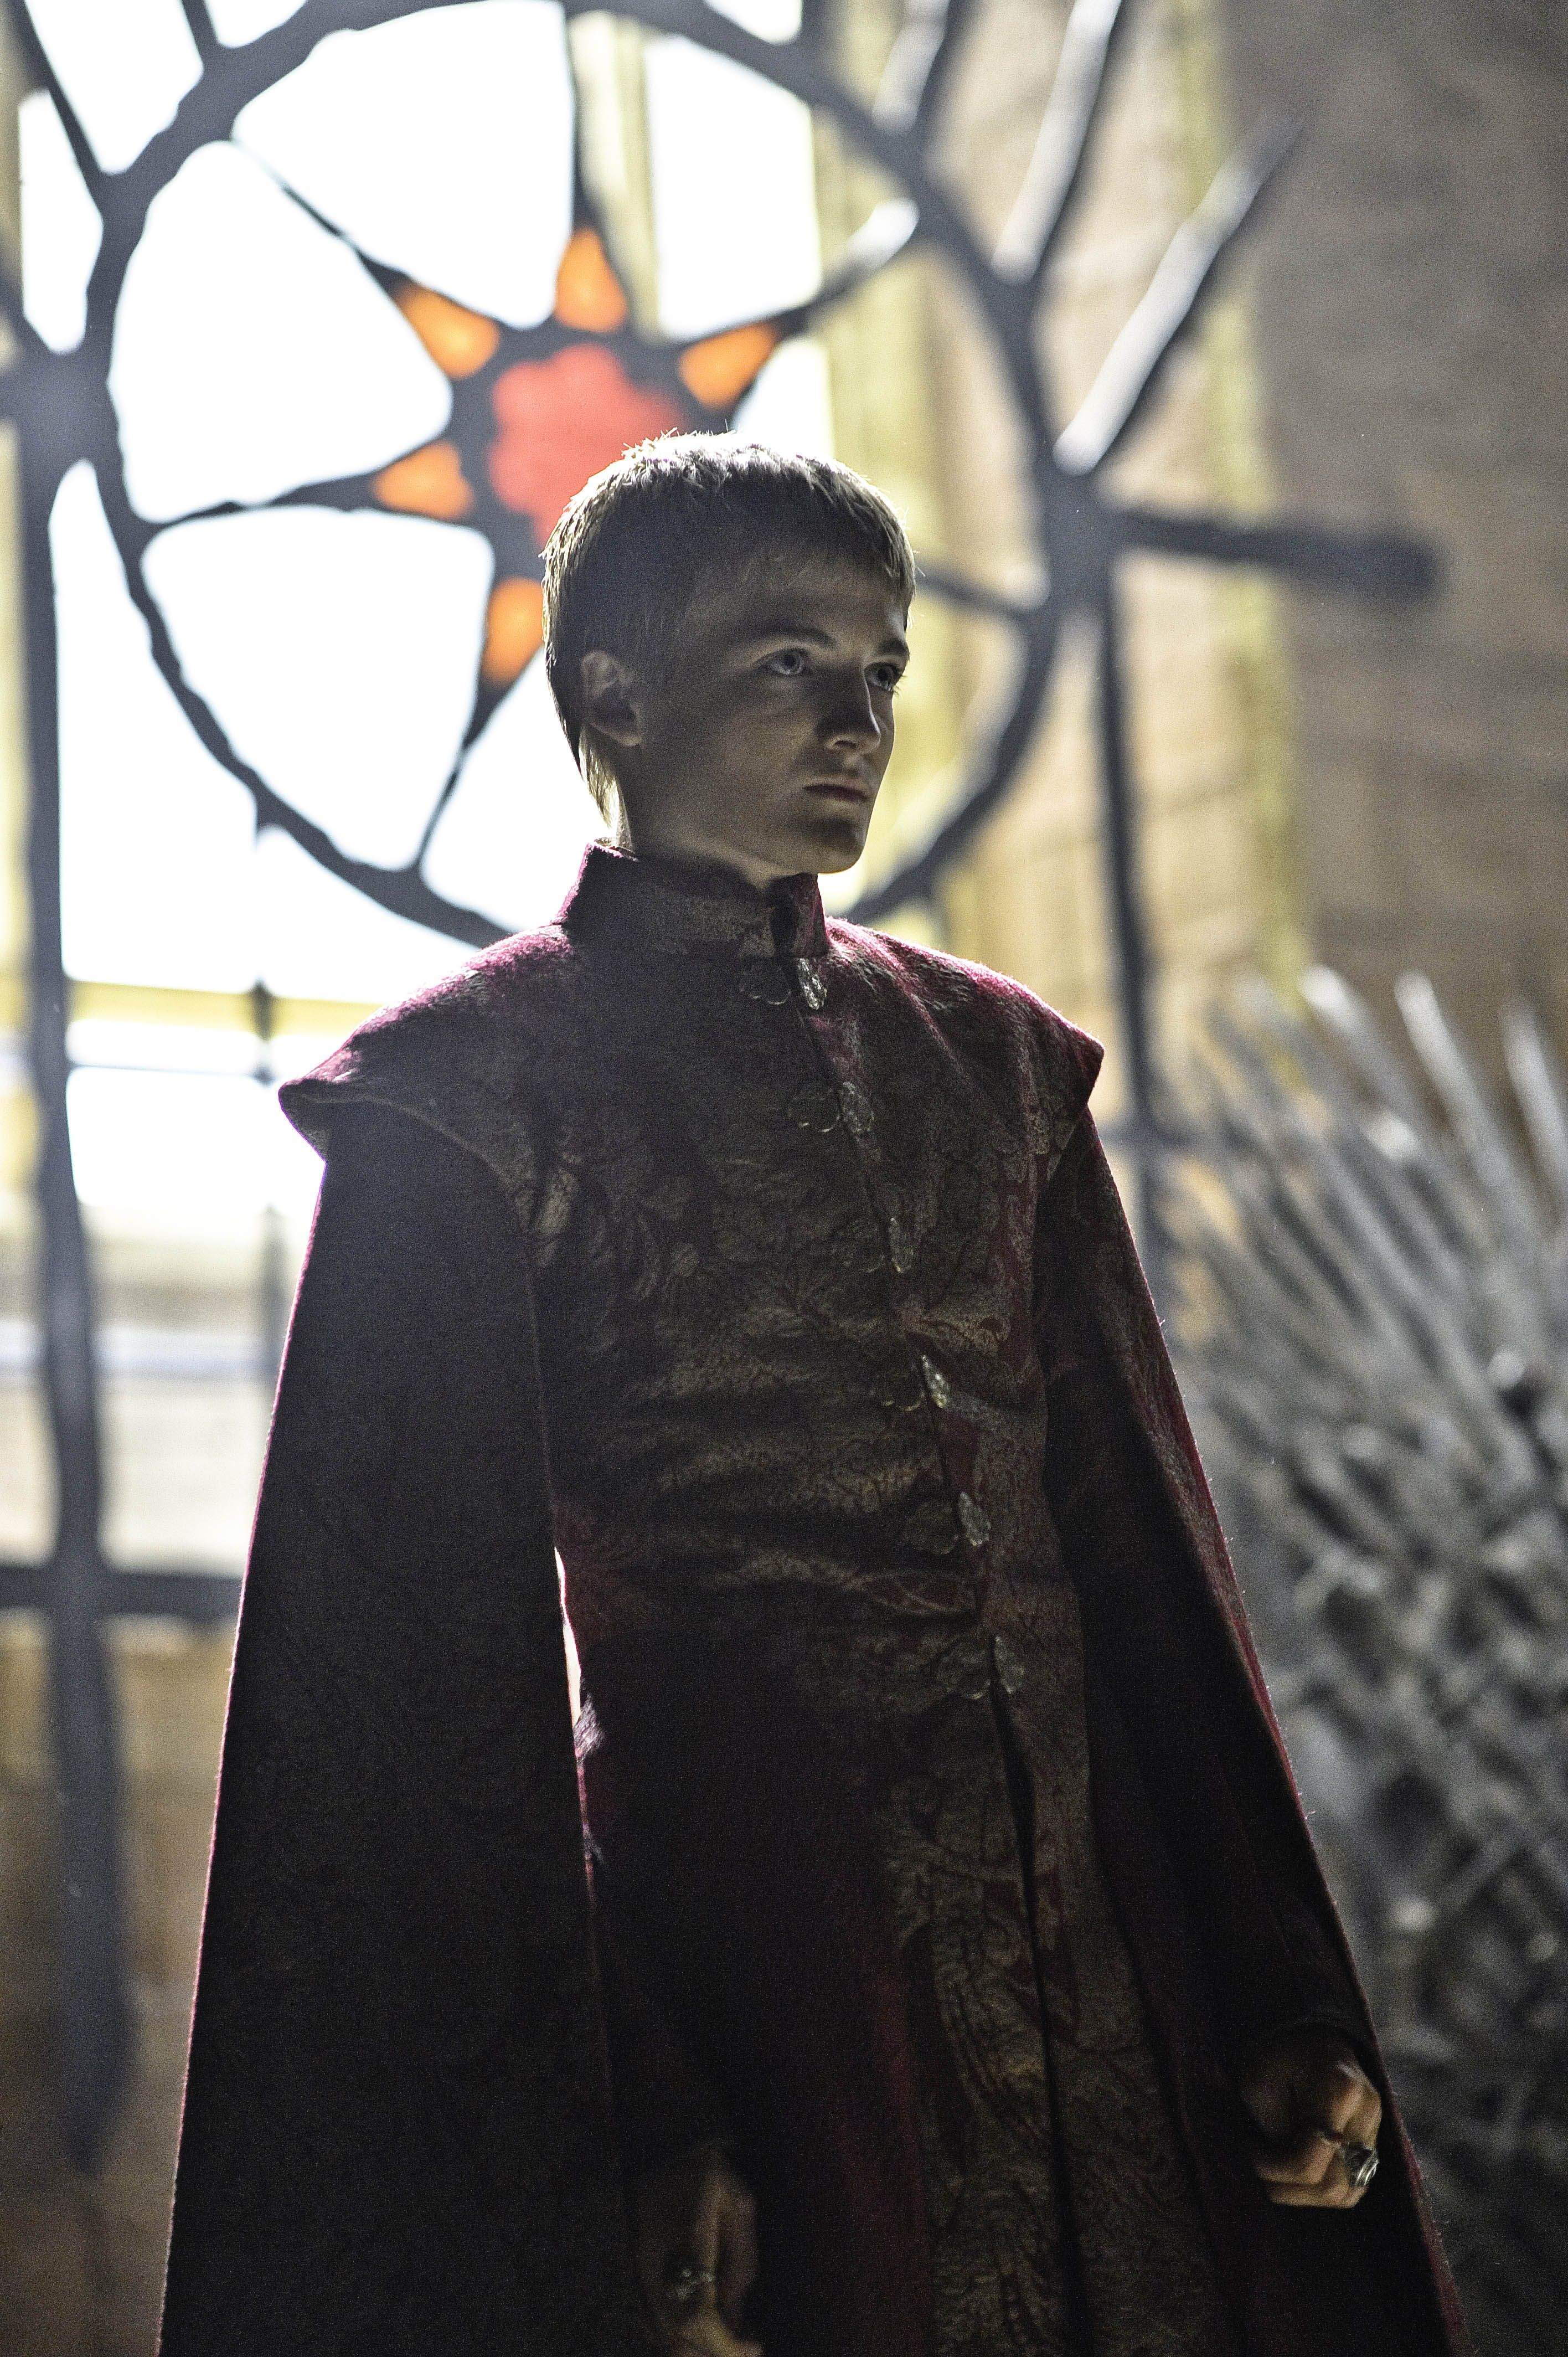 Game of Thrones - Season 2 Episode 1 Still | Game of ...